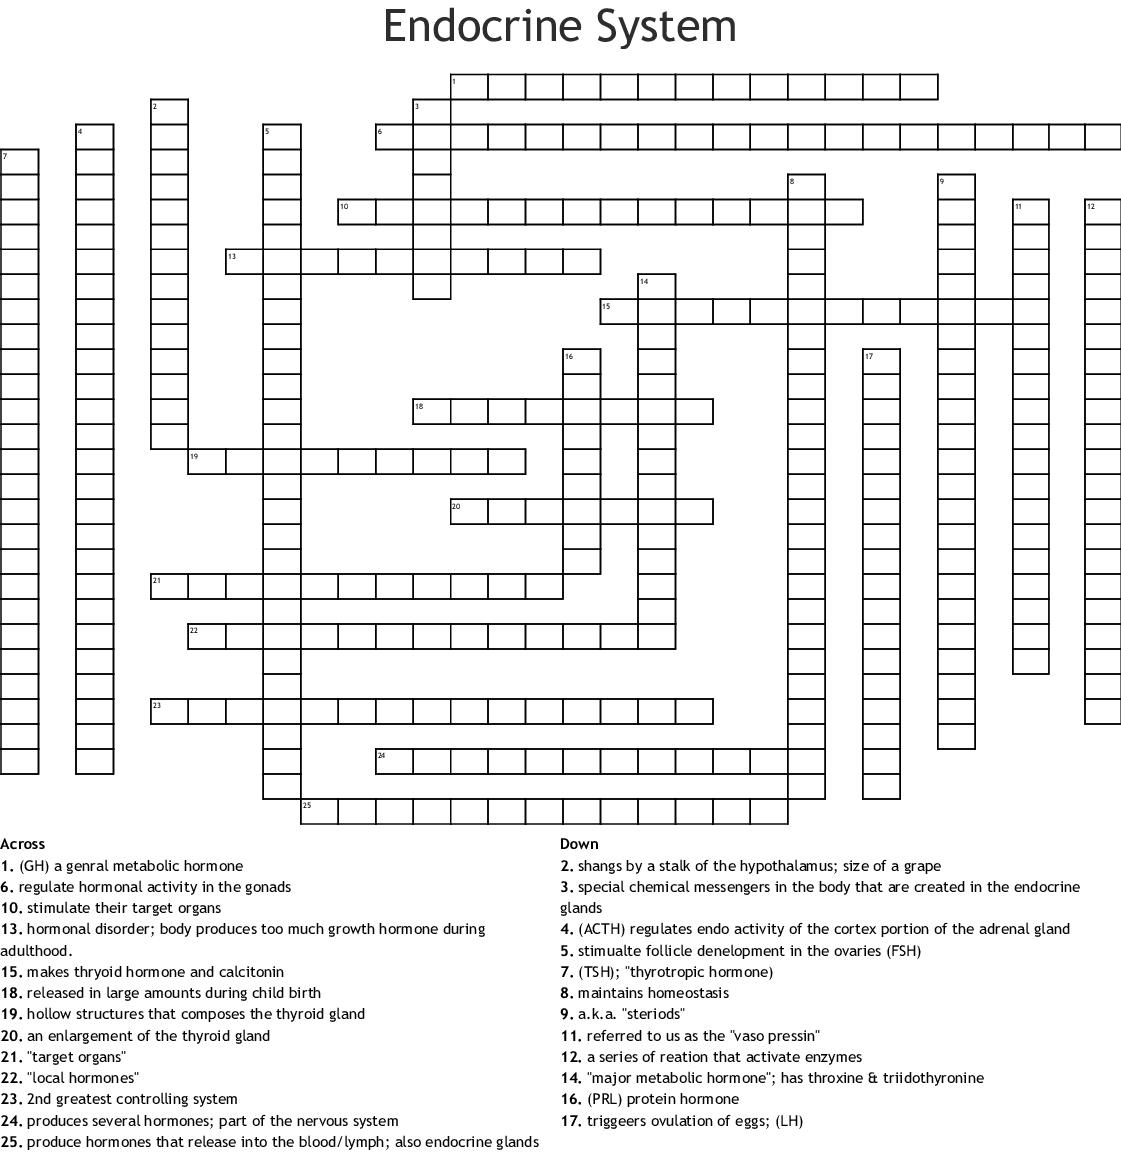 Endocrine System Crossword